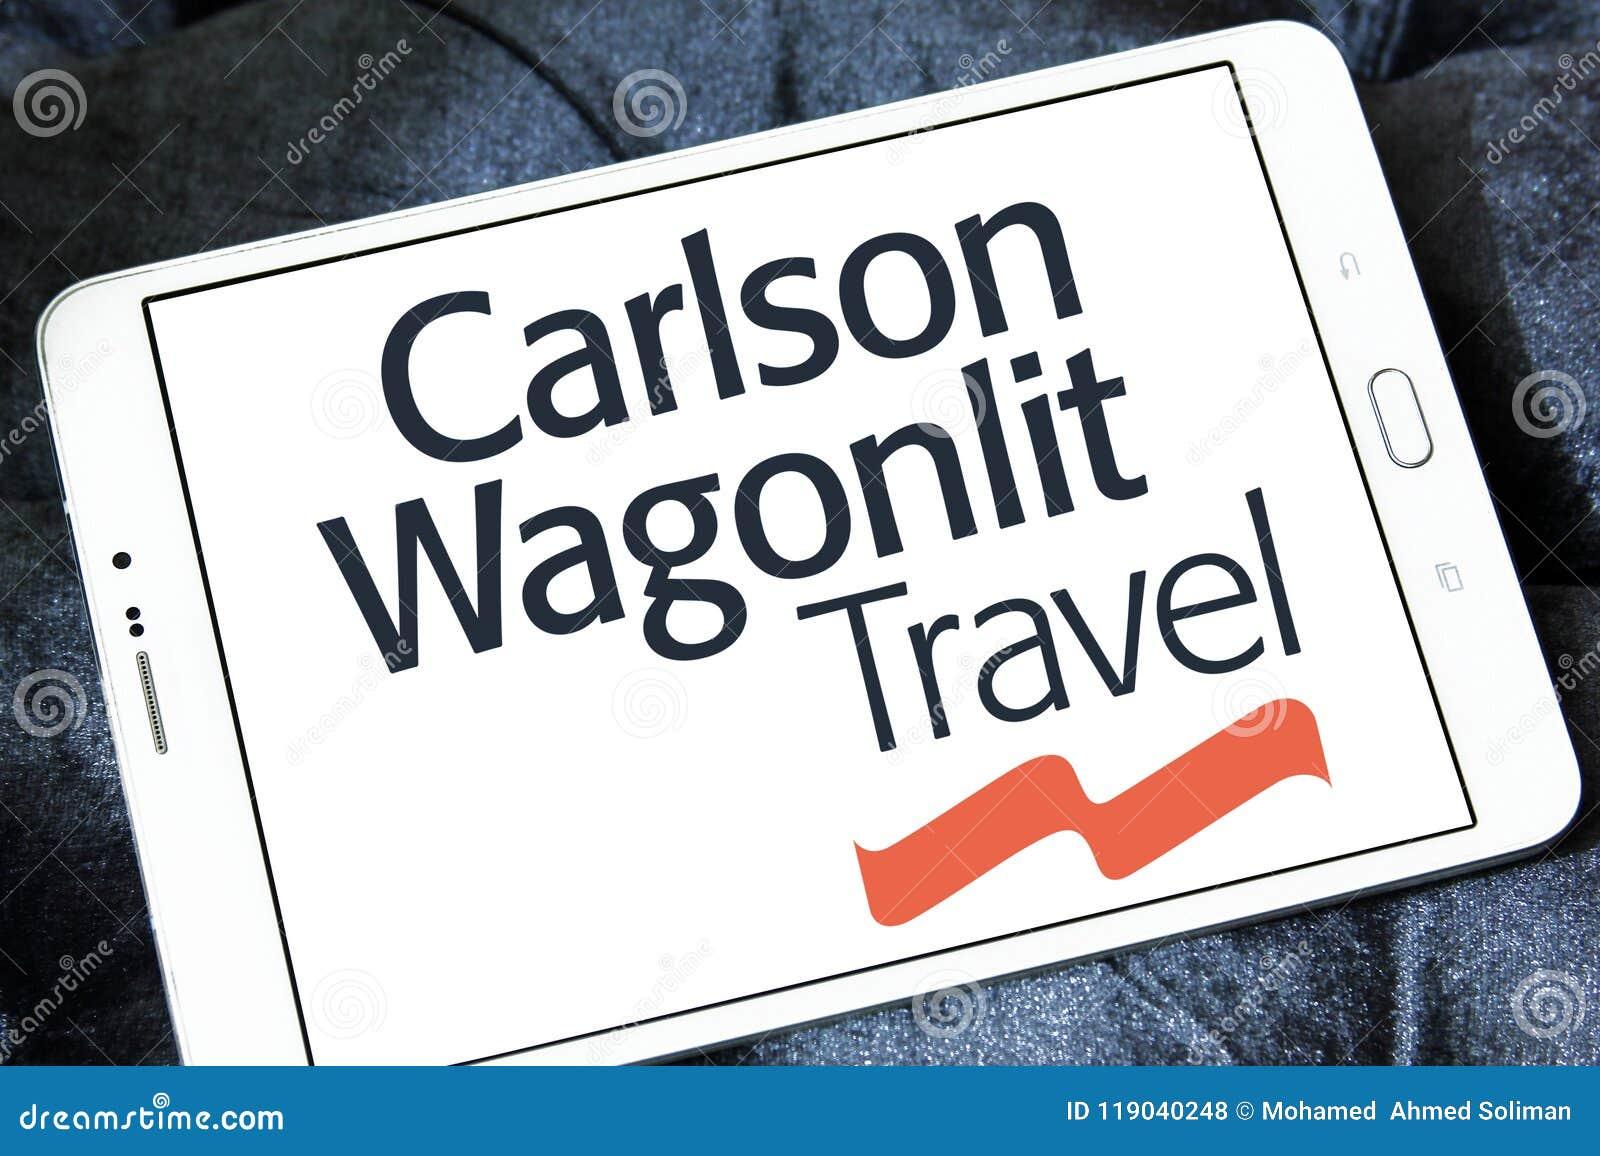 carlson wagonlit travel agency logo